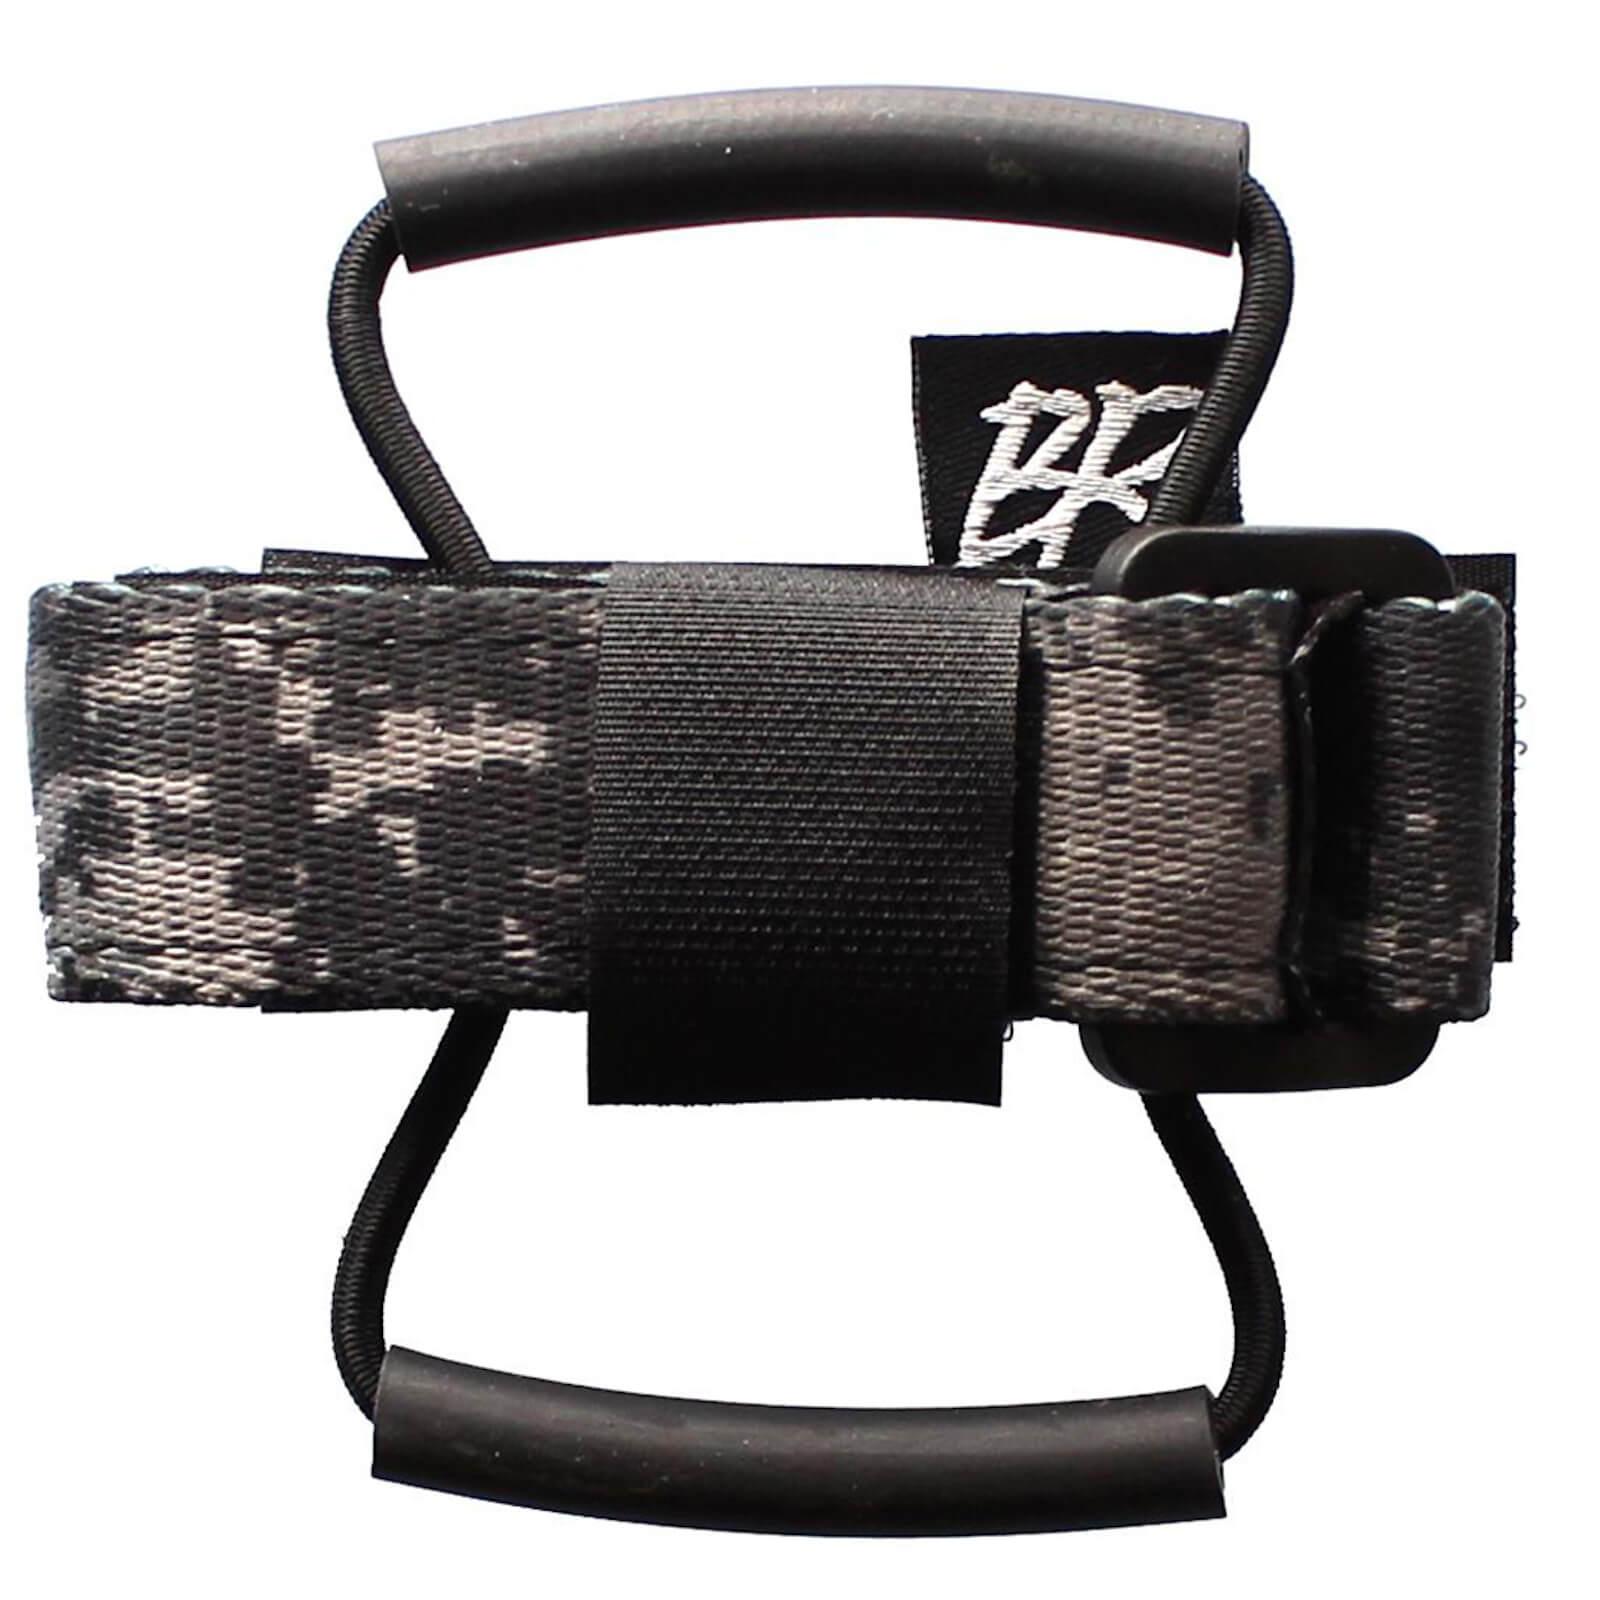 BackCountry Camrat Strap - Digital Dark Camo